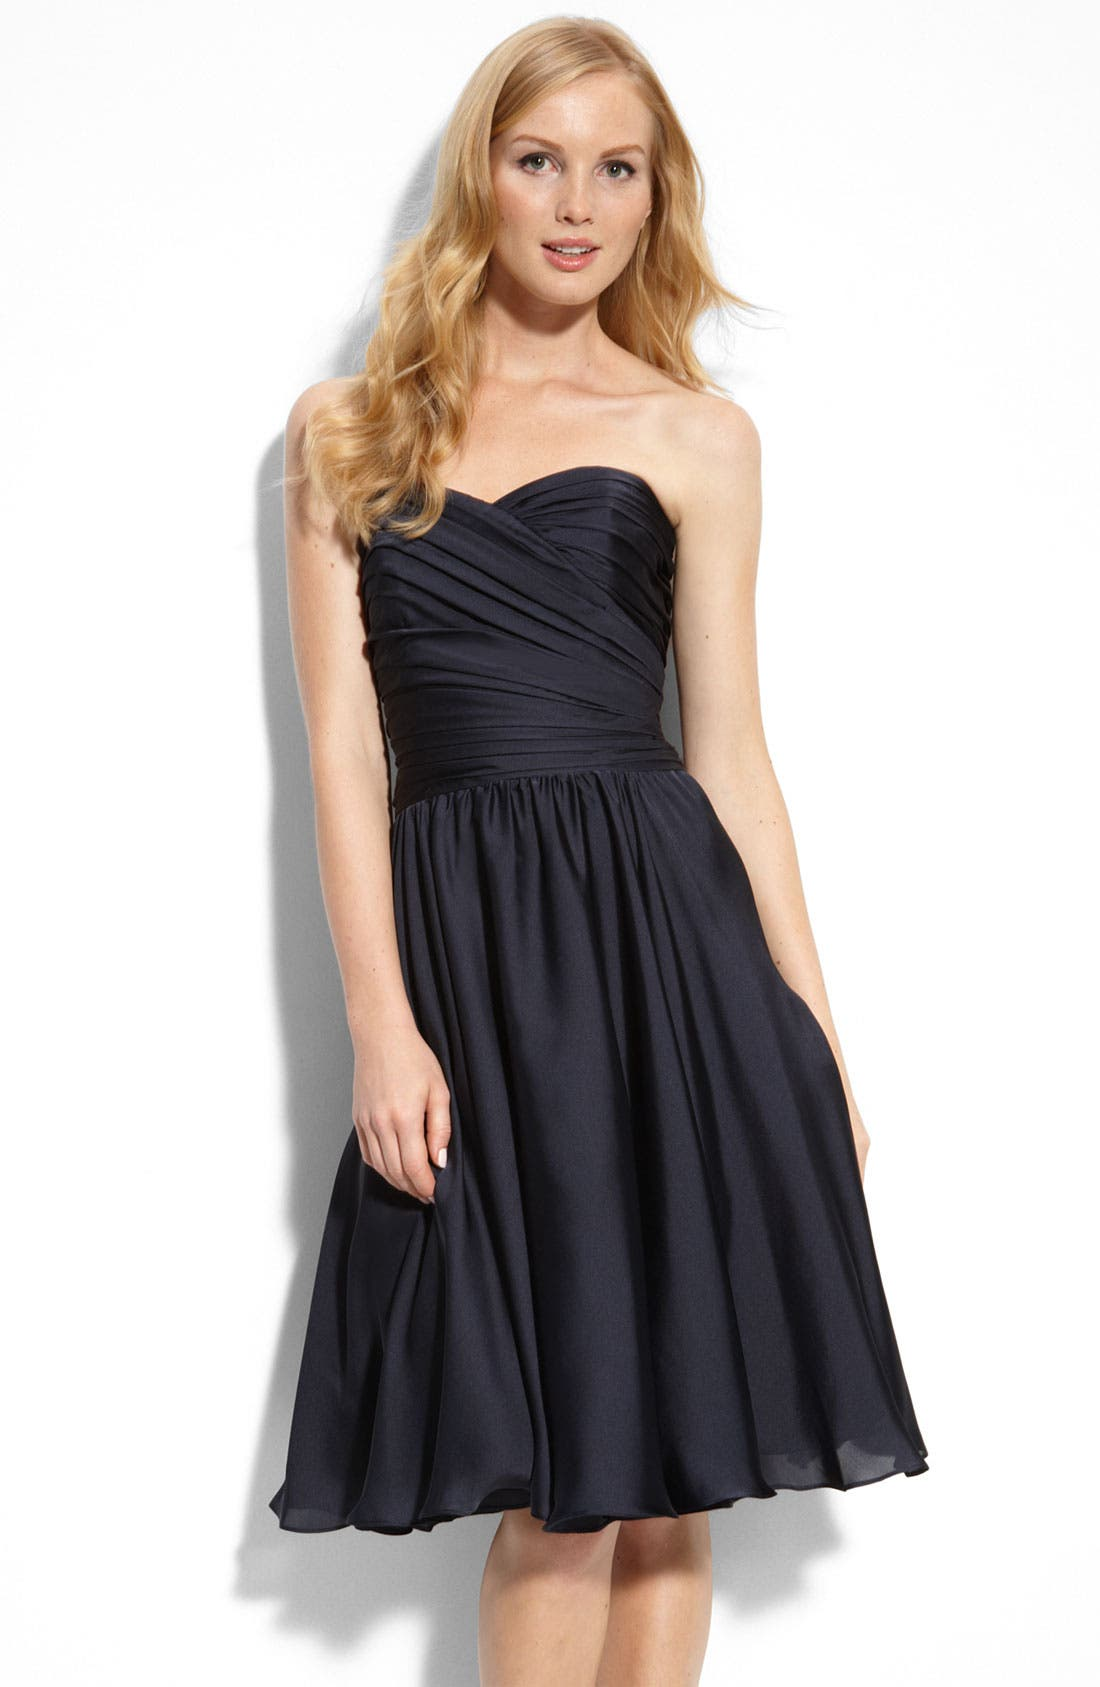 Alternate Image 1 Selected - ML Monique Lhuillier Bridesmaids Strapless Dress